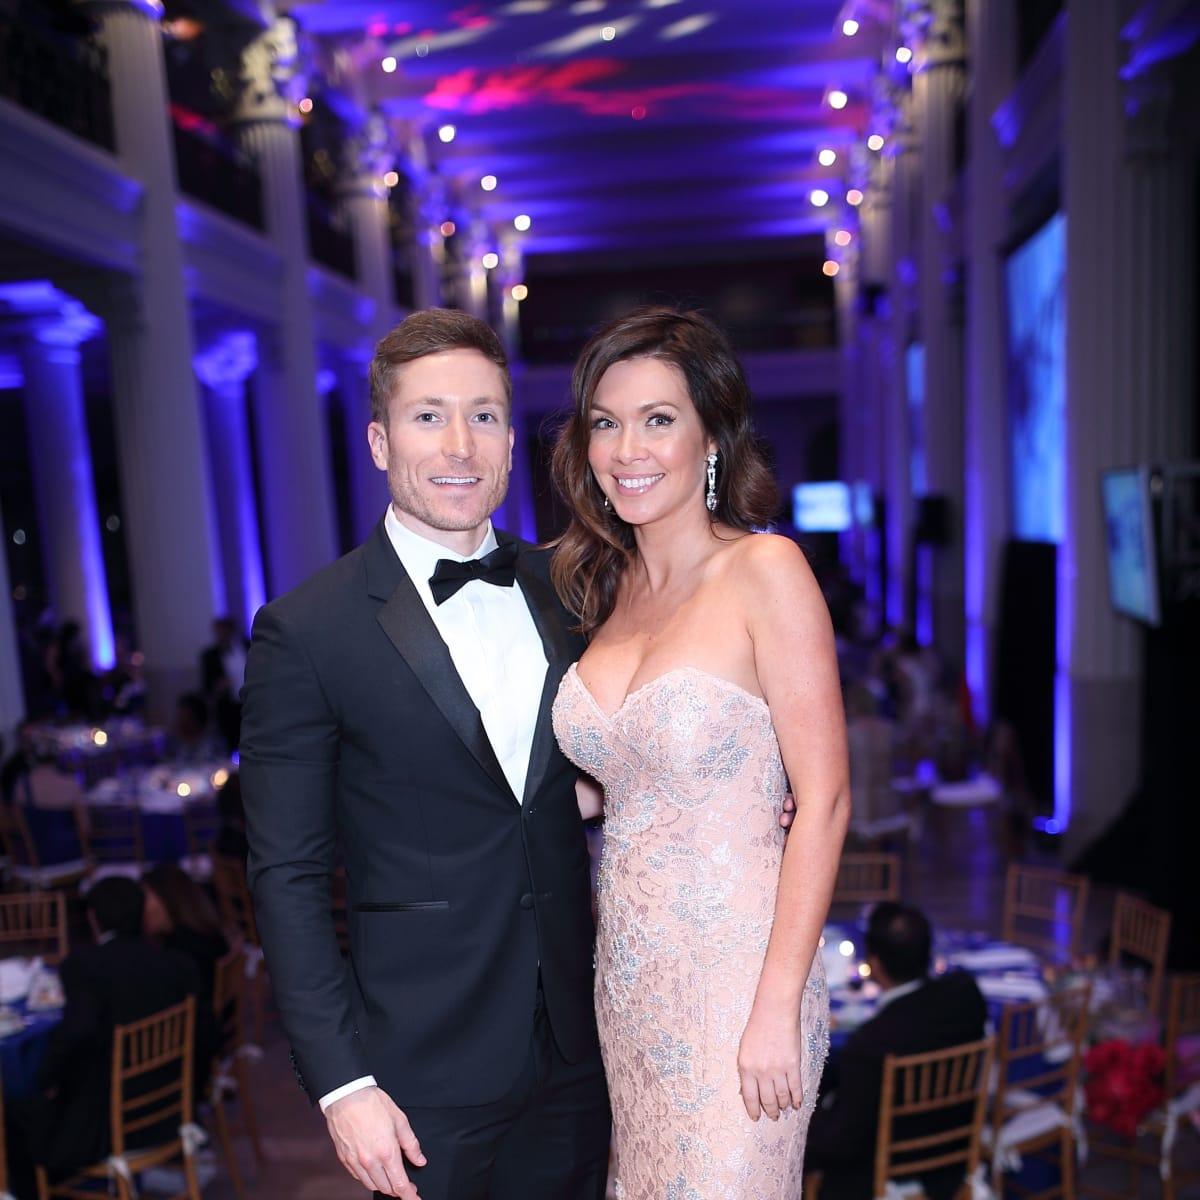 Shaun Lynch, Jentry Kelly at Denali Gala